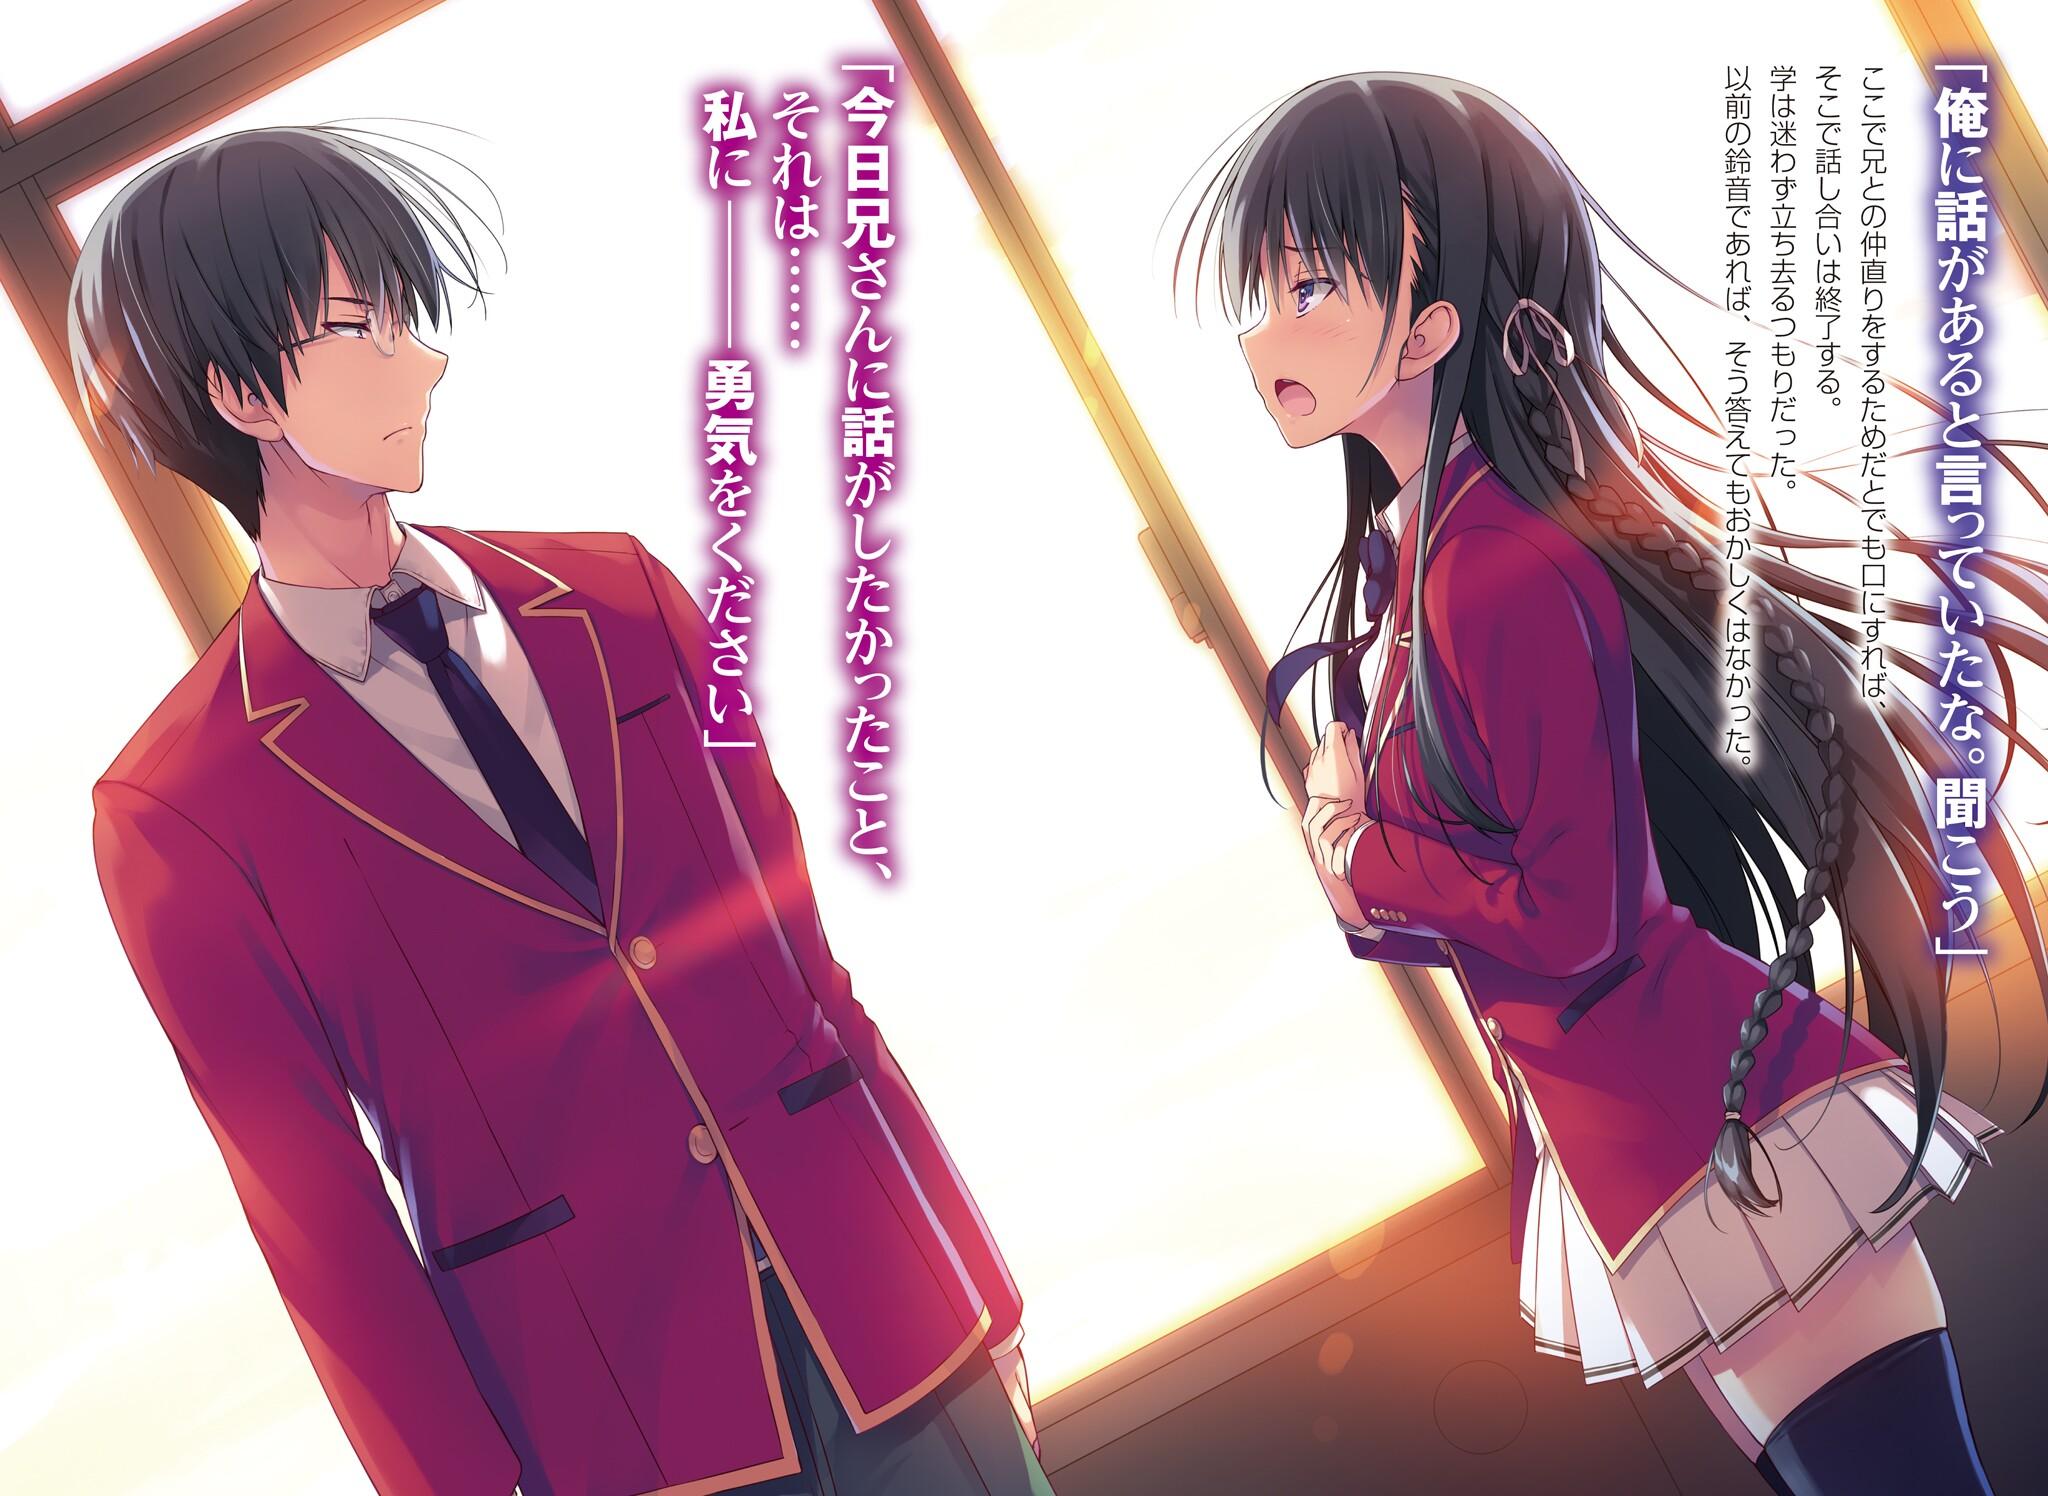 Nhân vật Manabu Horikita - Class room of the Elite